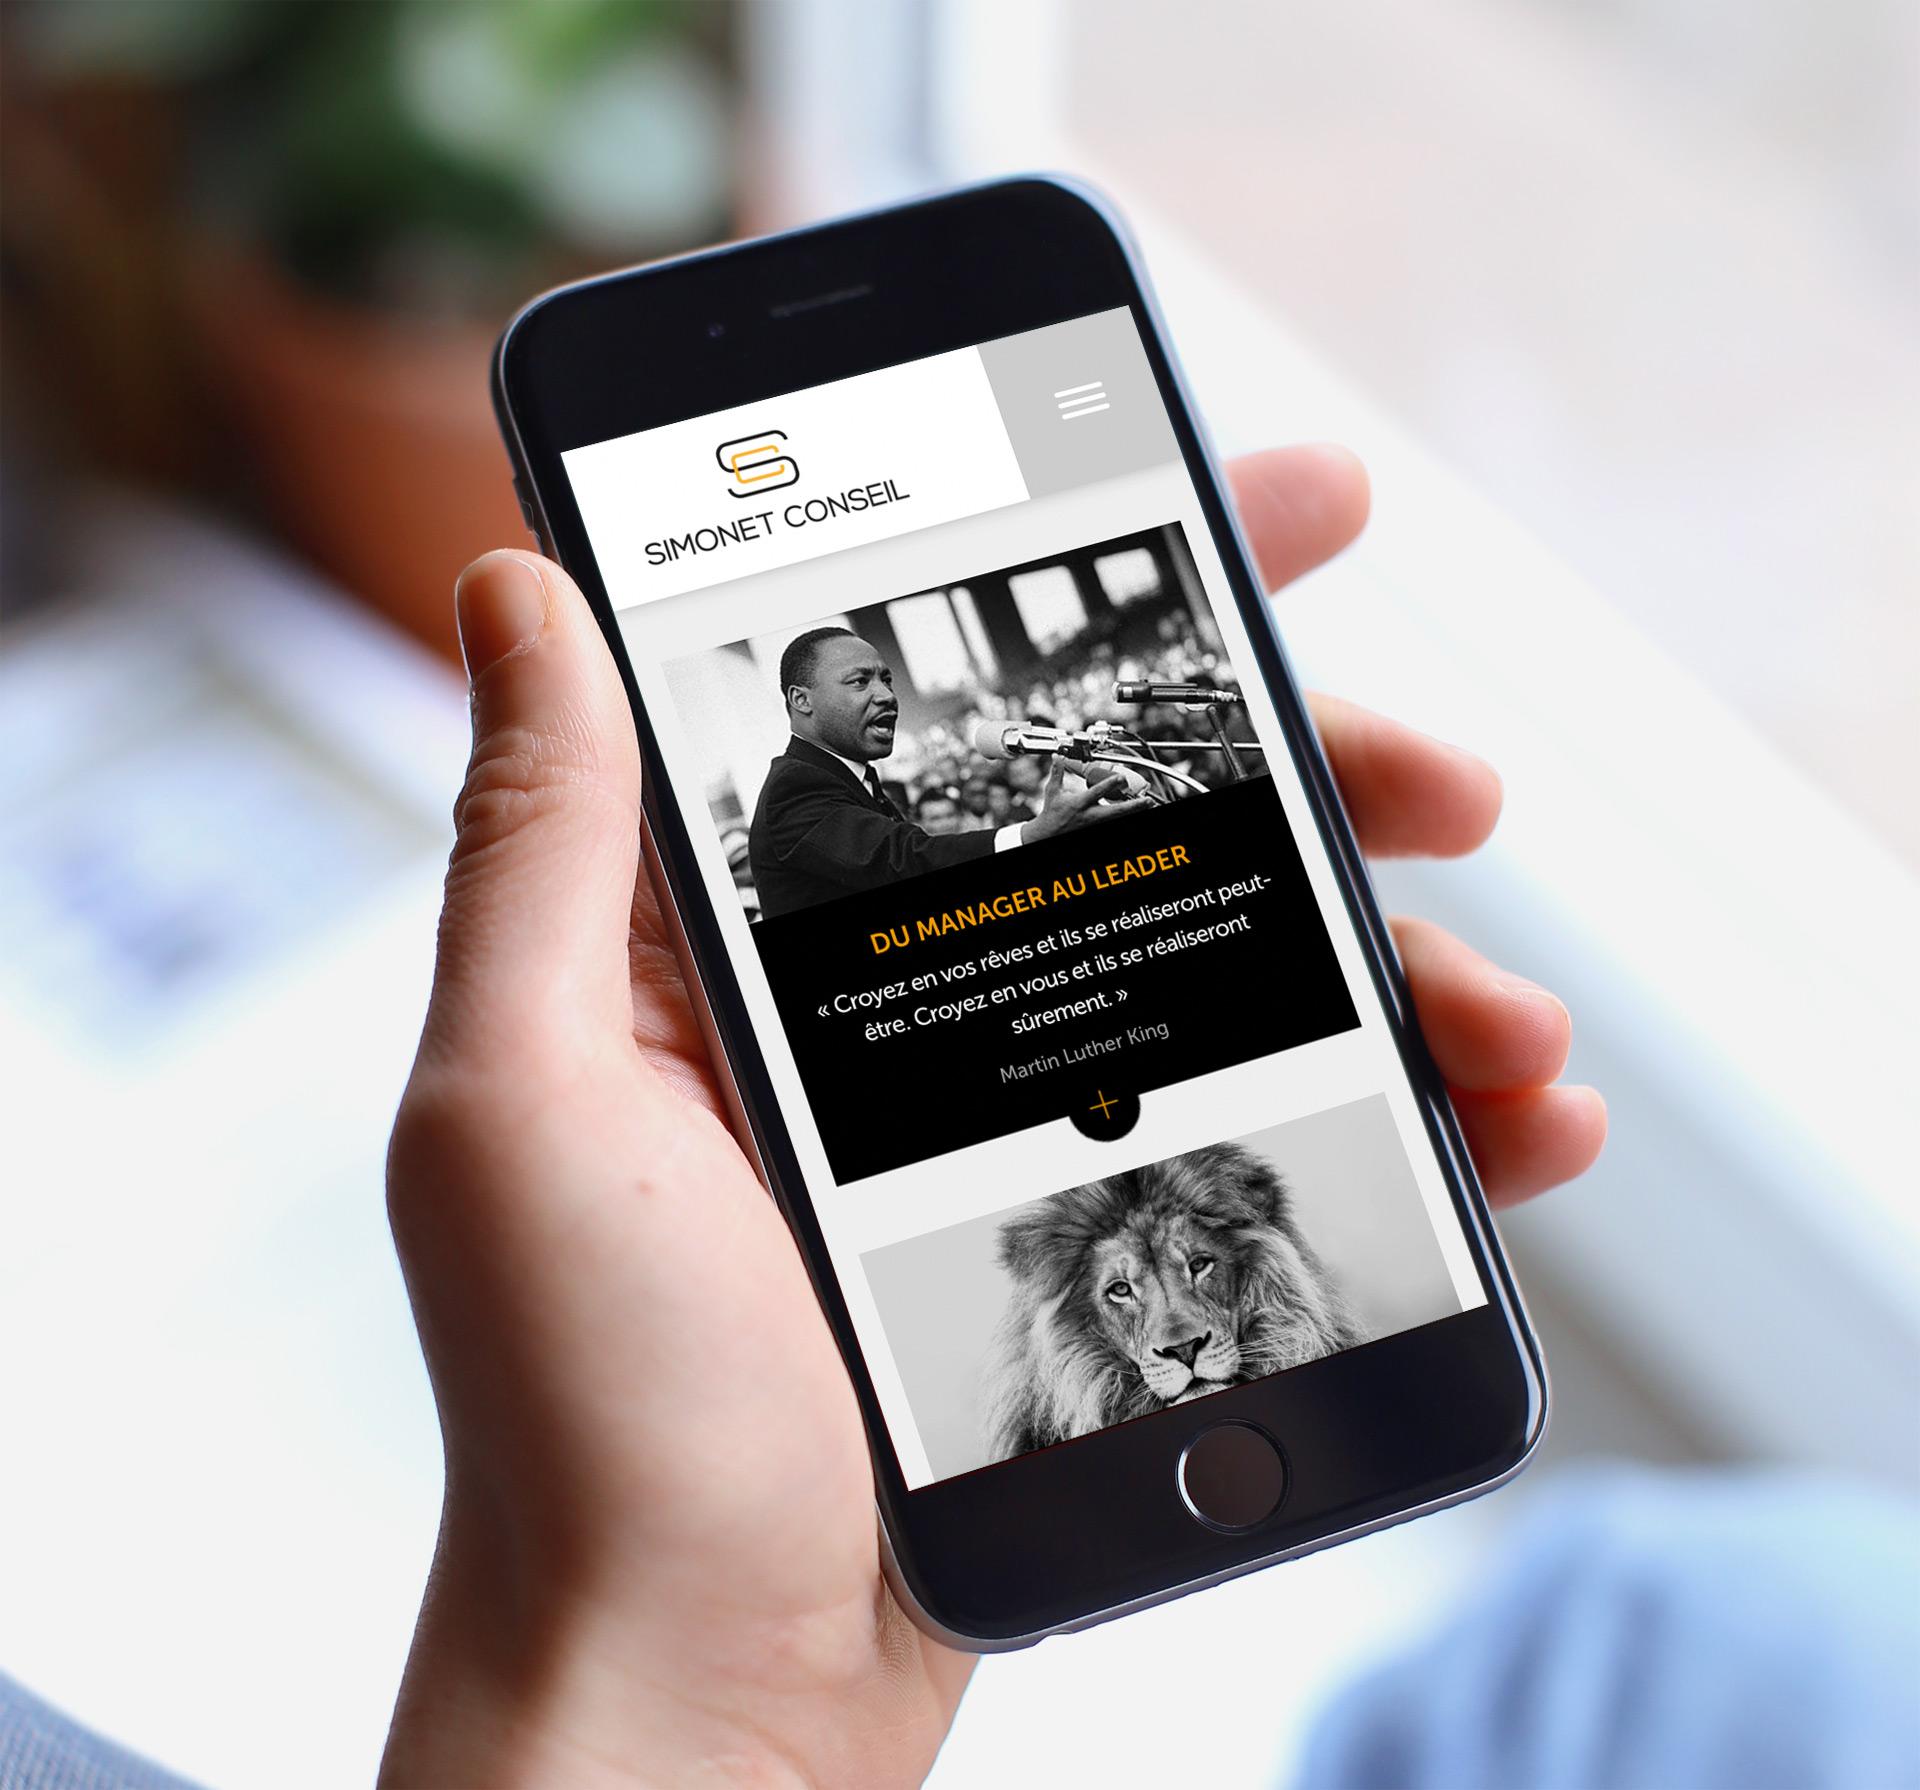 simonet-conseil-creation-site-mobile-responsive-design-caconcept-alexis-cretin-graphiste-montpellier